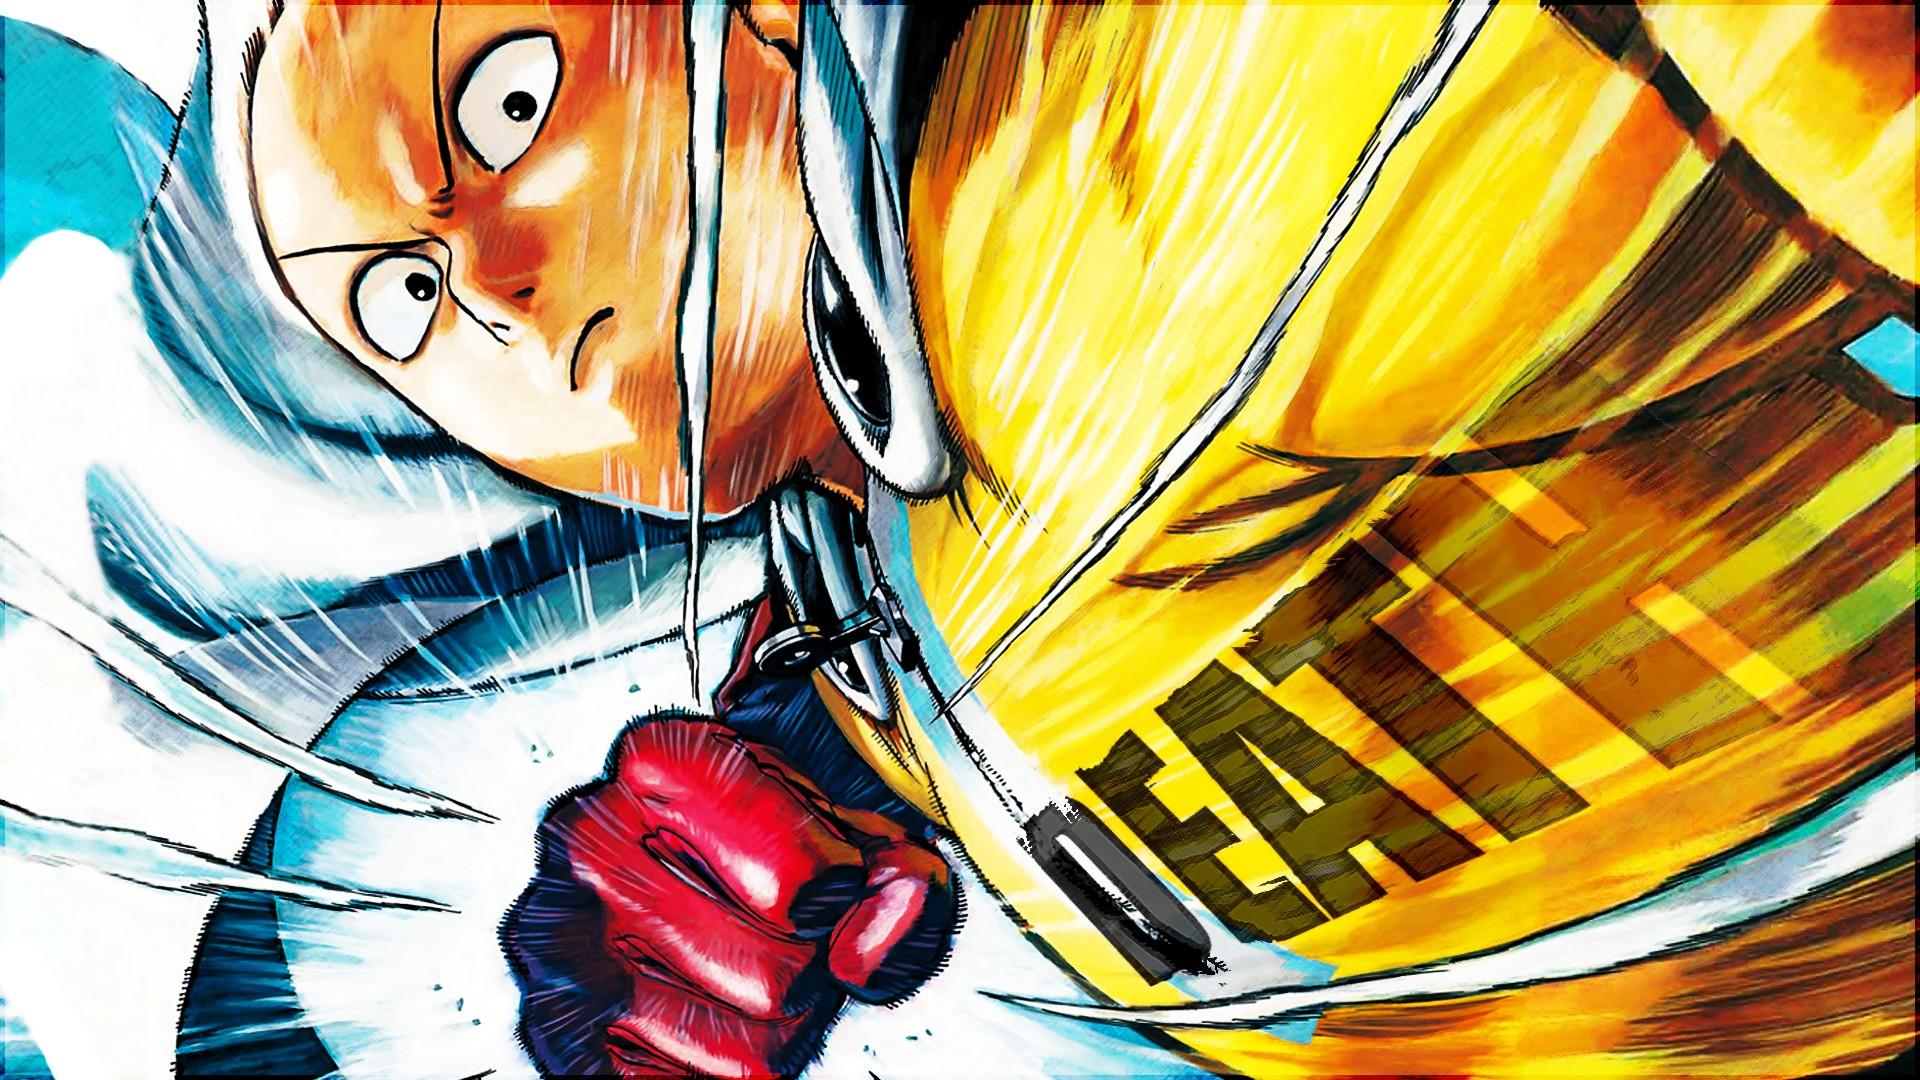 One Punch Man Wallpaper Hd Download Free Stunning Hd